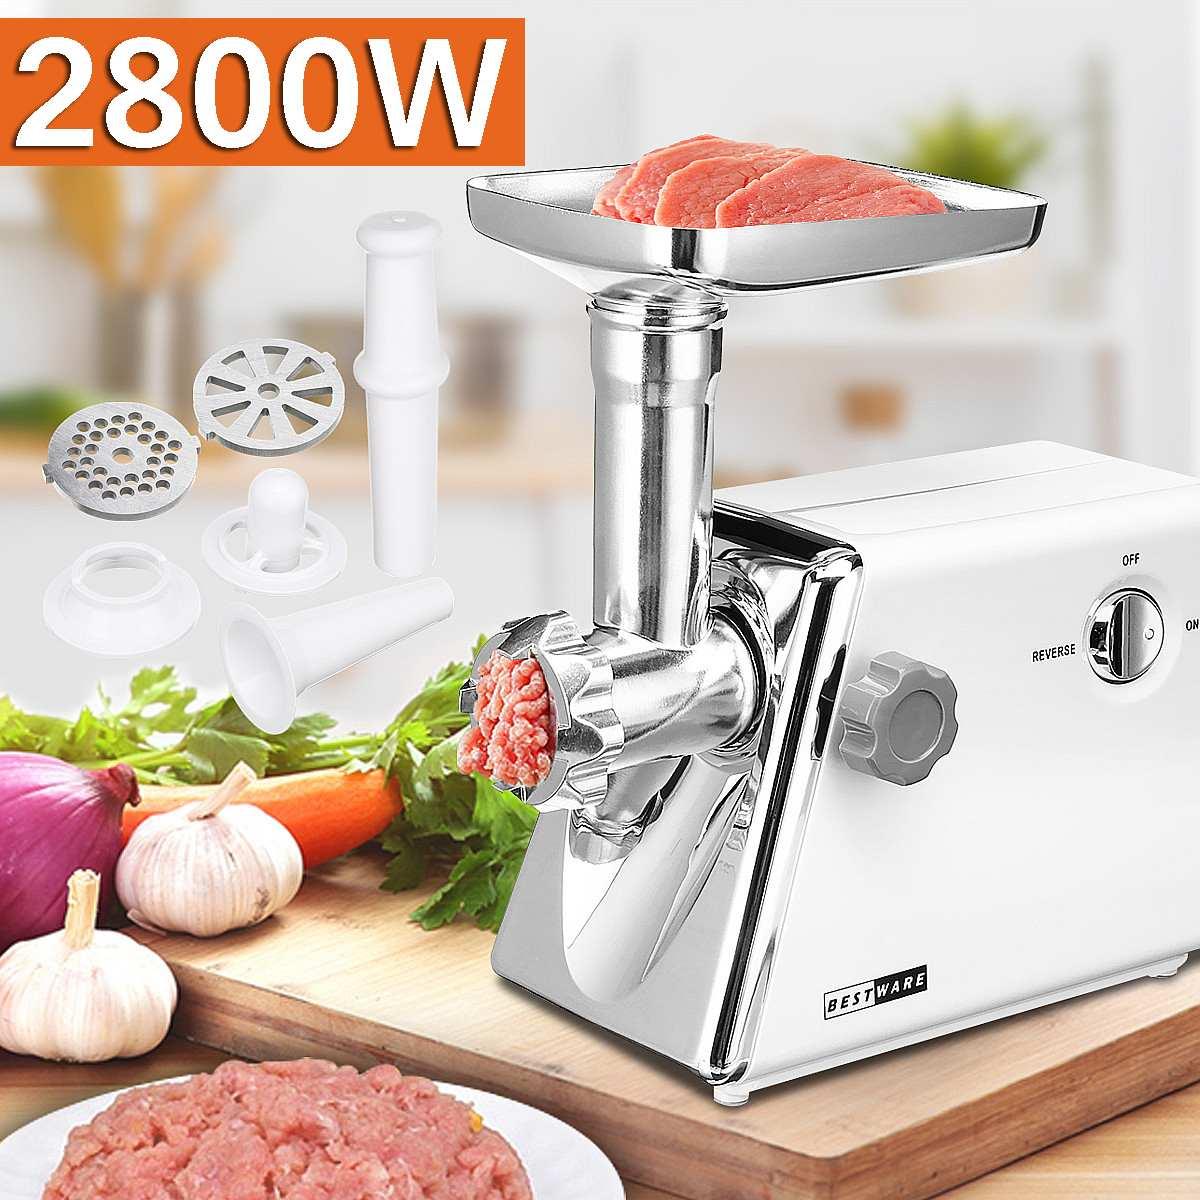 220V-240V 2800W Multifunction Electric Meat Grinder Sausage Machine Mincer Kitchen Tool Three Grinding Plates Anti-skid Base